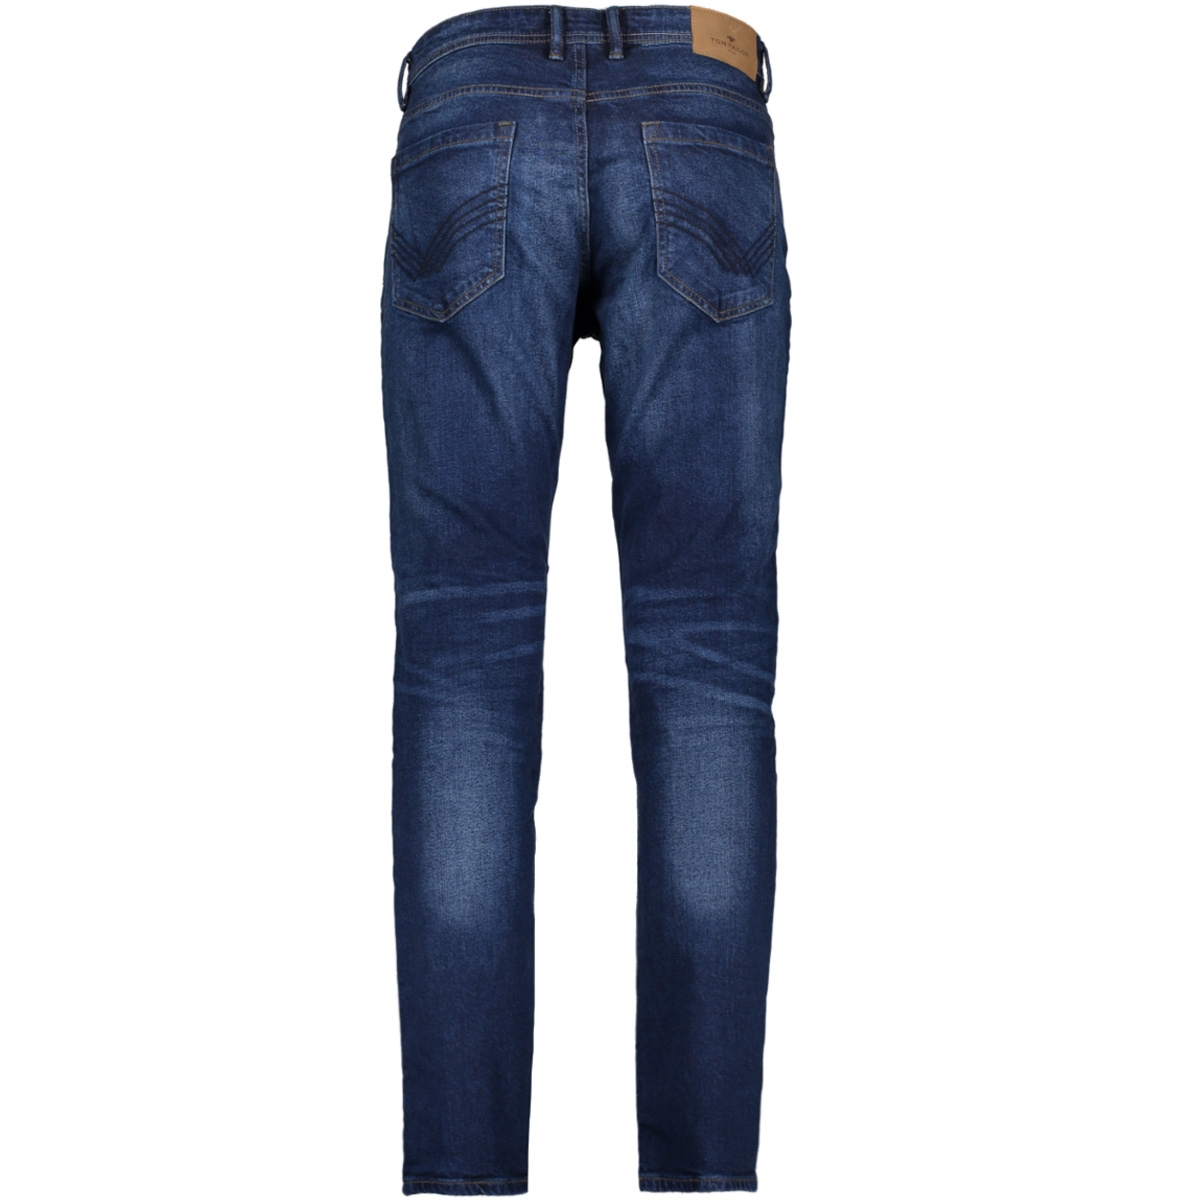 6205920.00.10 tom tailor jeans 1053